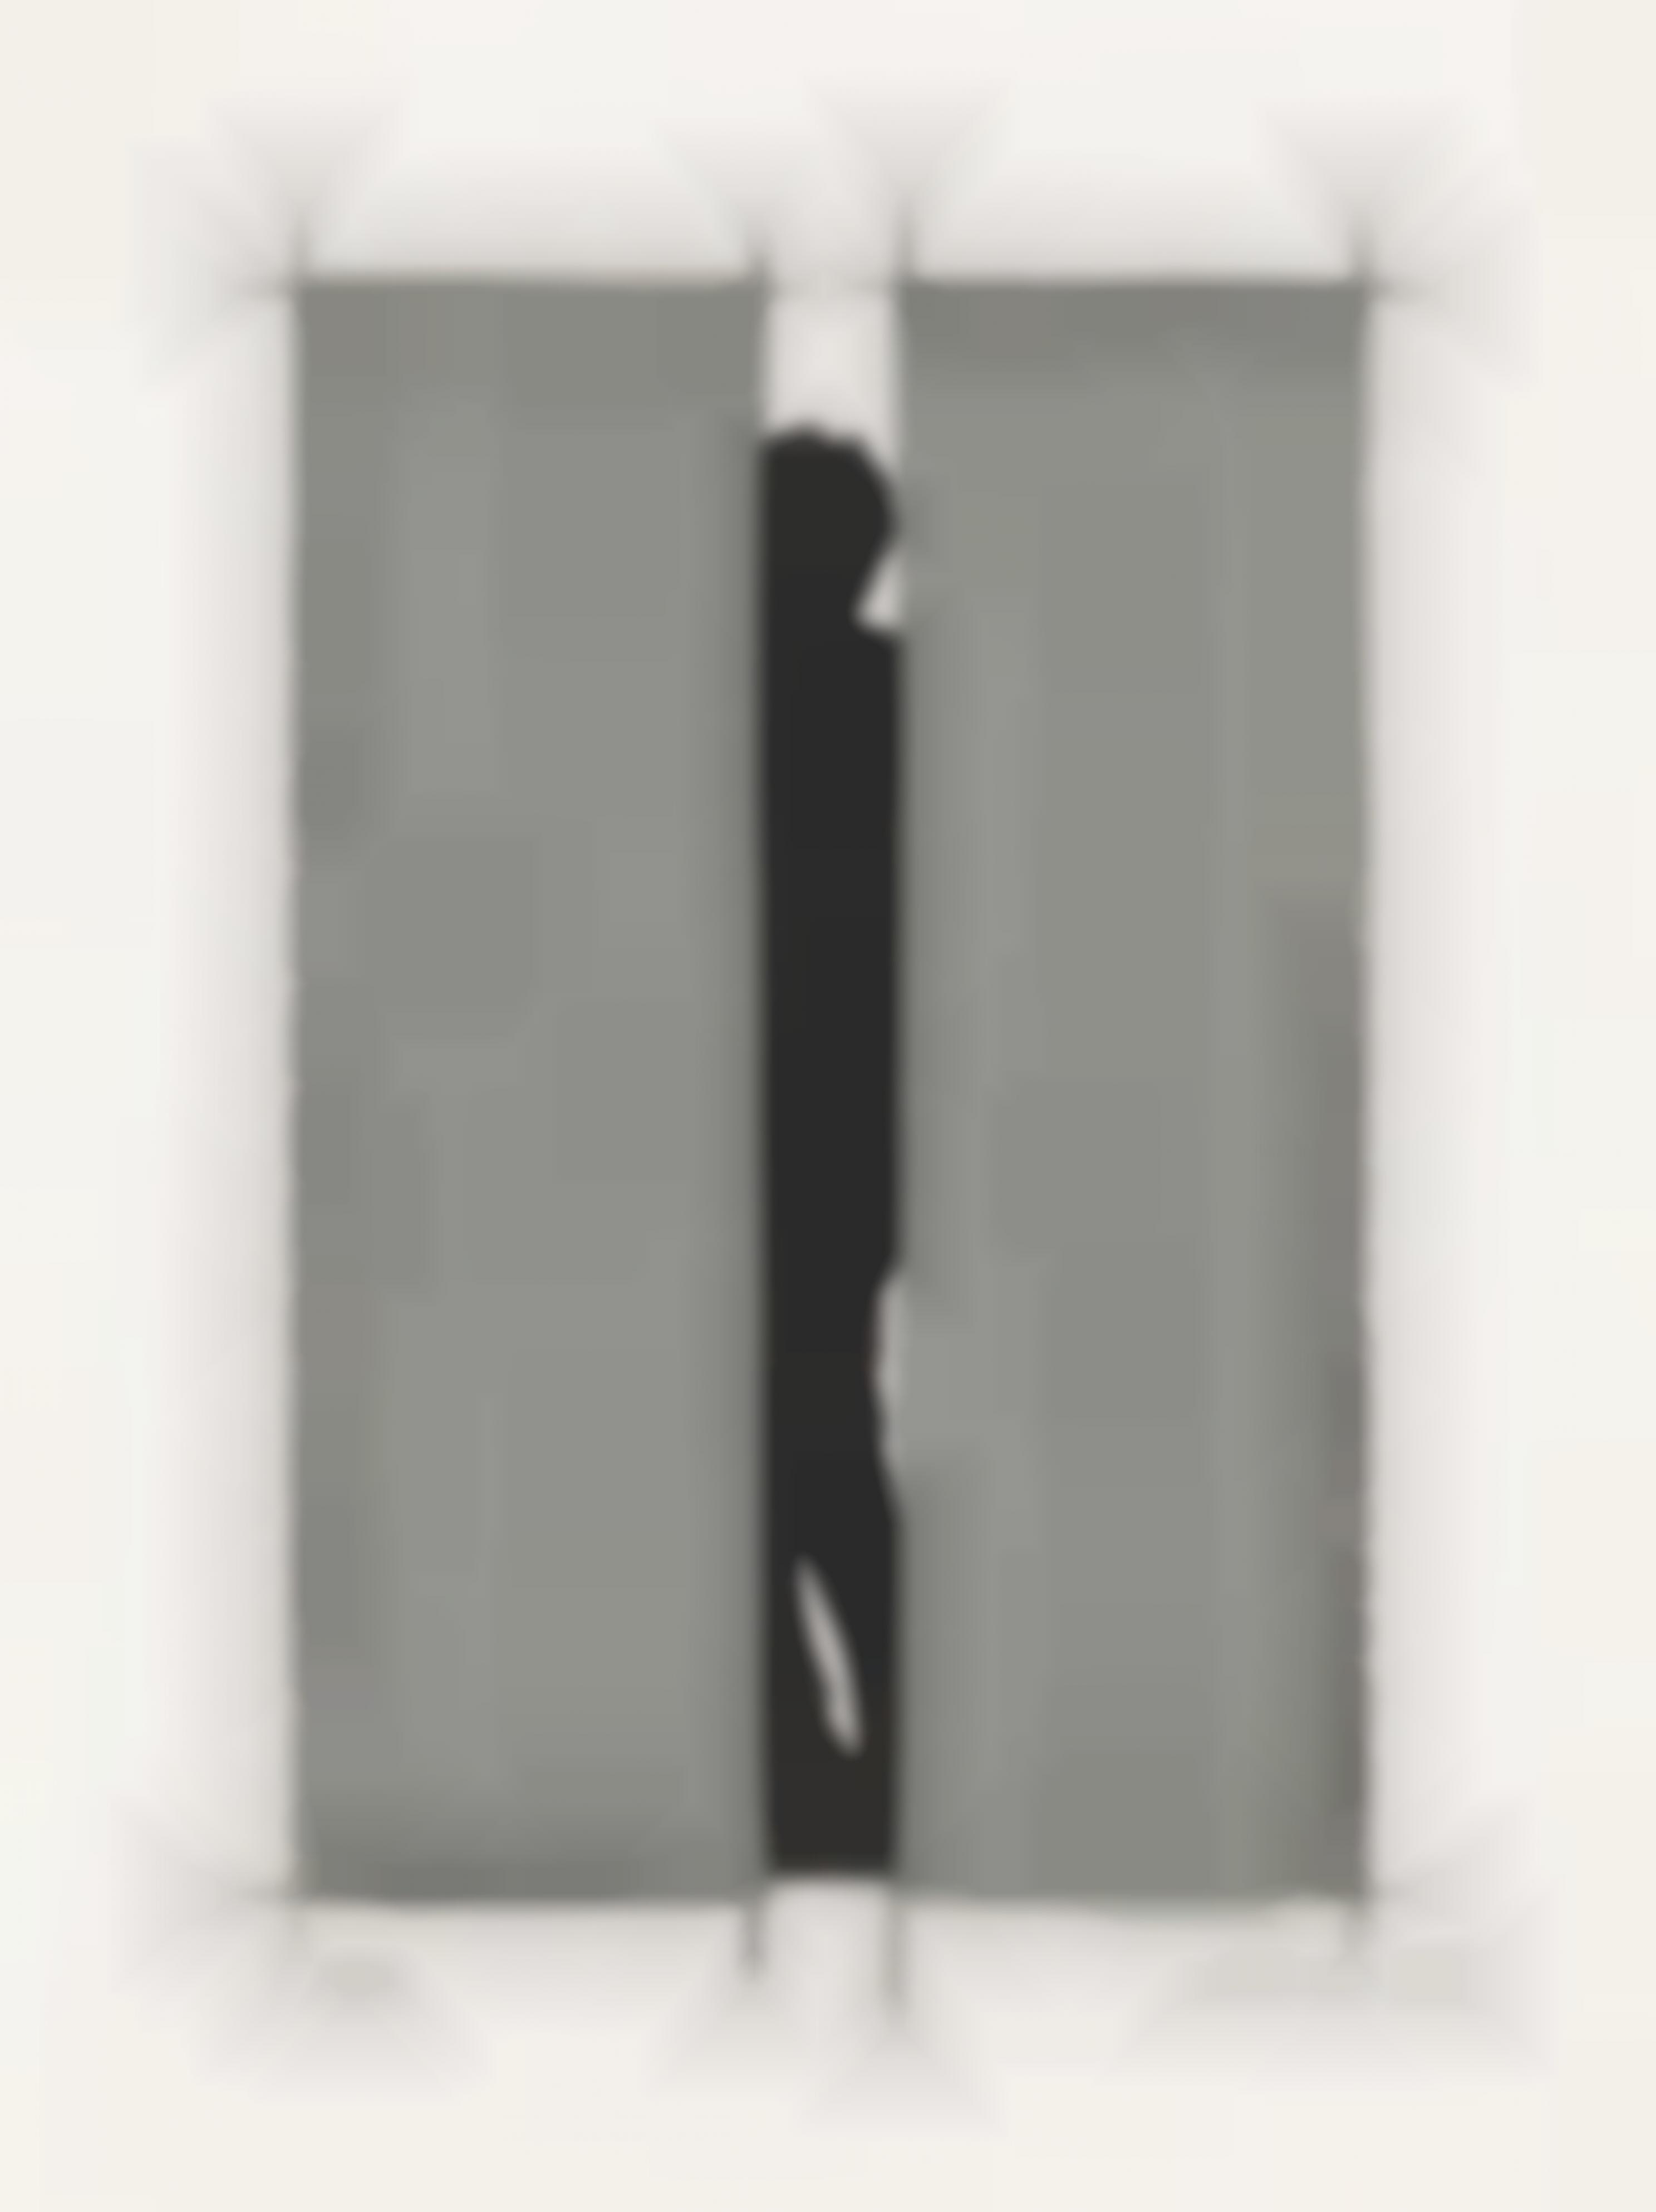 Sacha Sosno - Untitled-1993